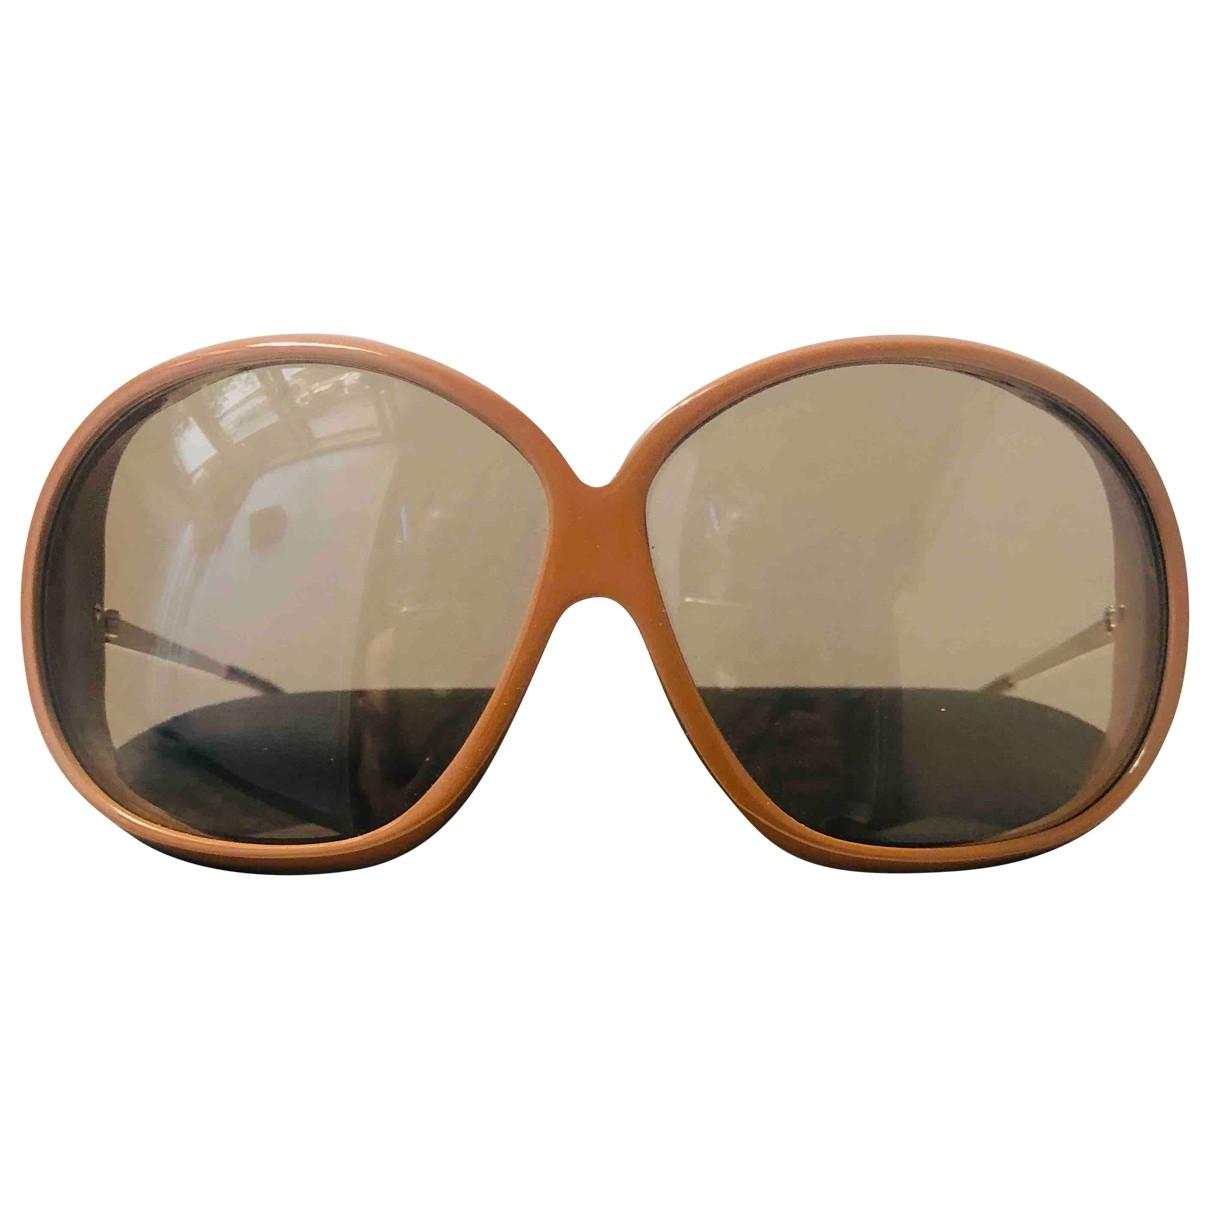 Marni \N Sonnenbrillen in  Beige Kunststoff